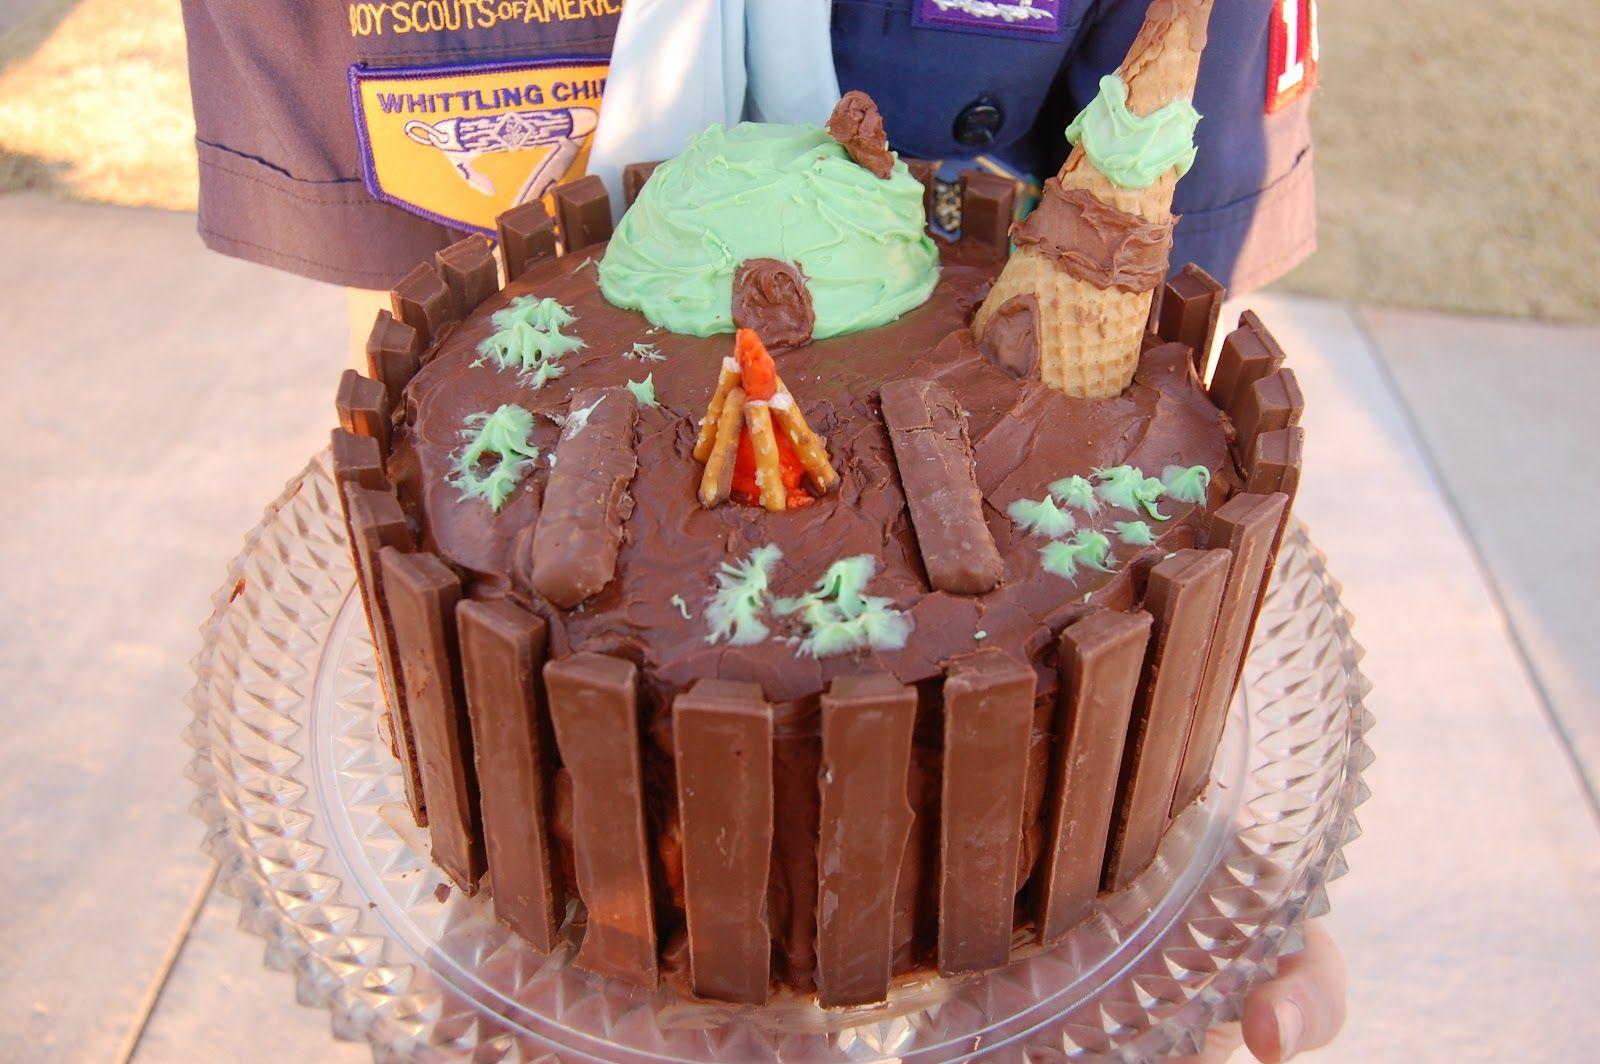 boy+scout+cake+decorating | Boy Scout Cake Ideas & boy+scout+cake+decorating | Boy Scout Cake Ideas | POTATOES ...